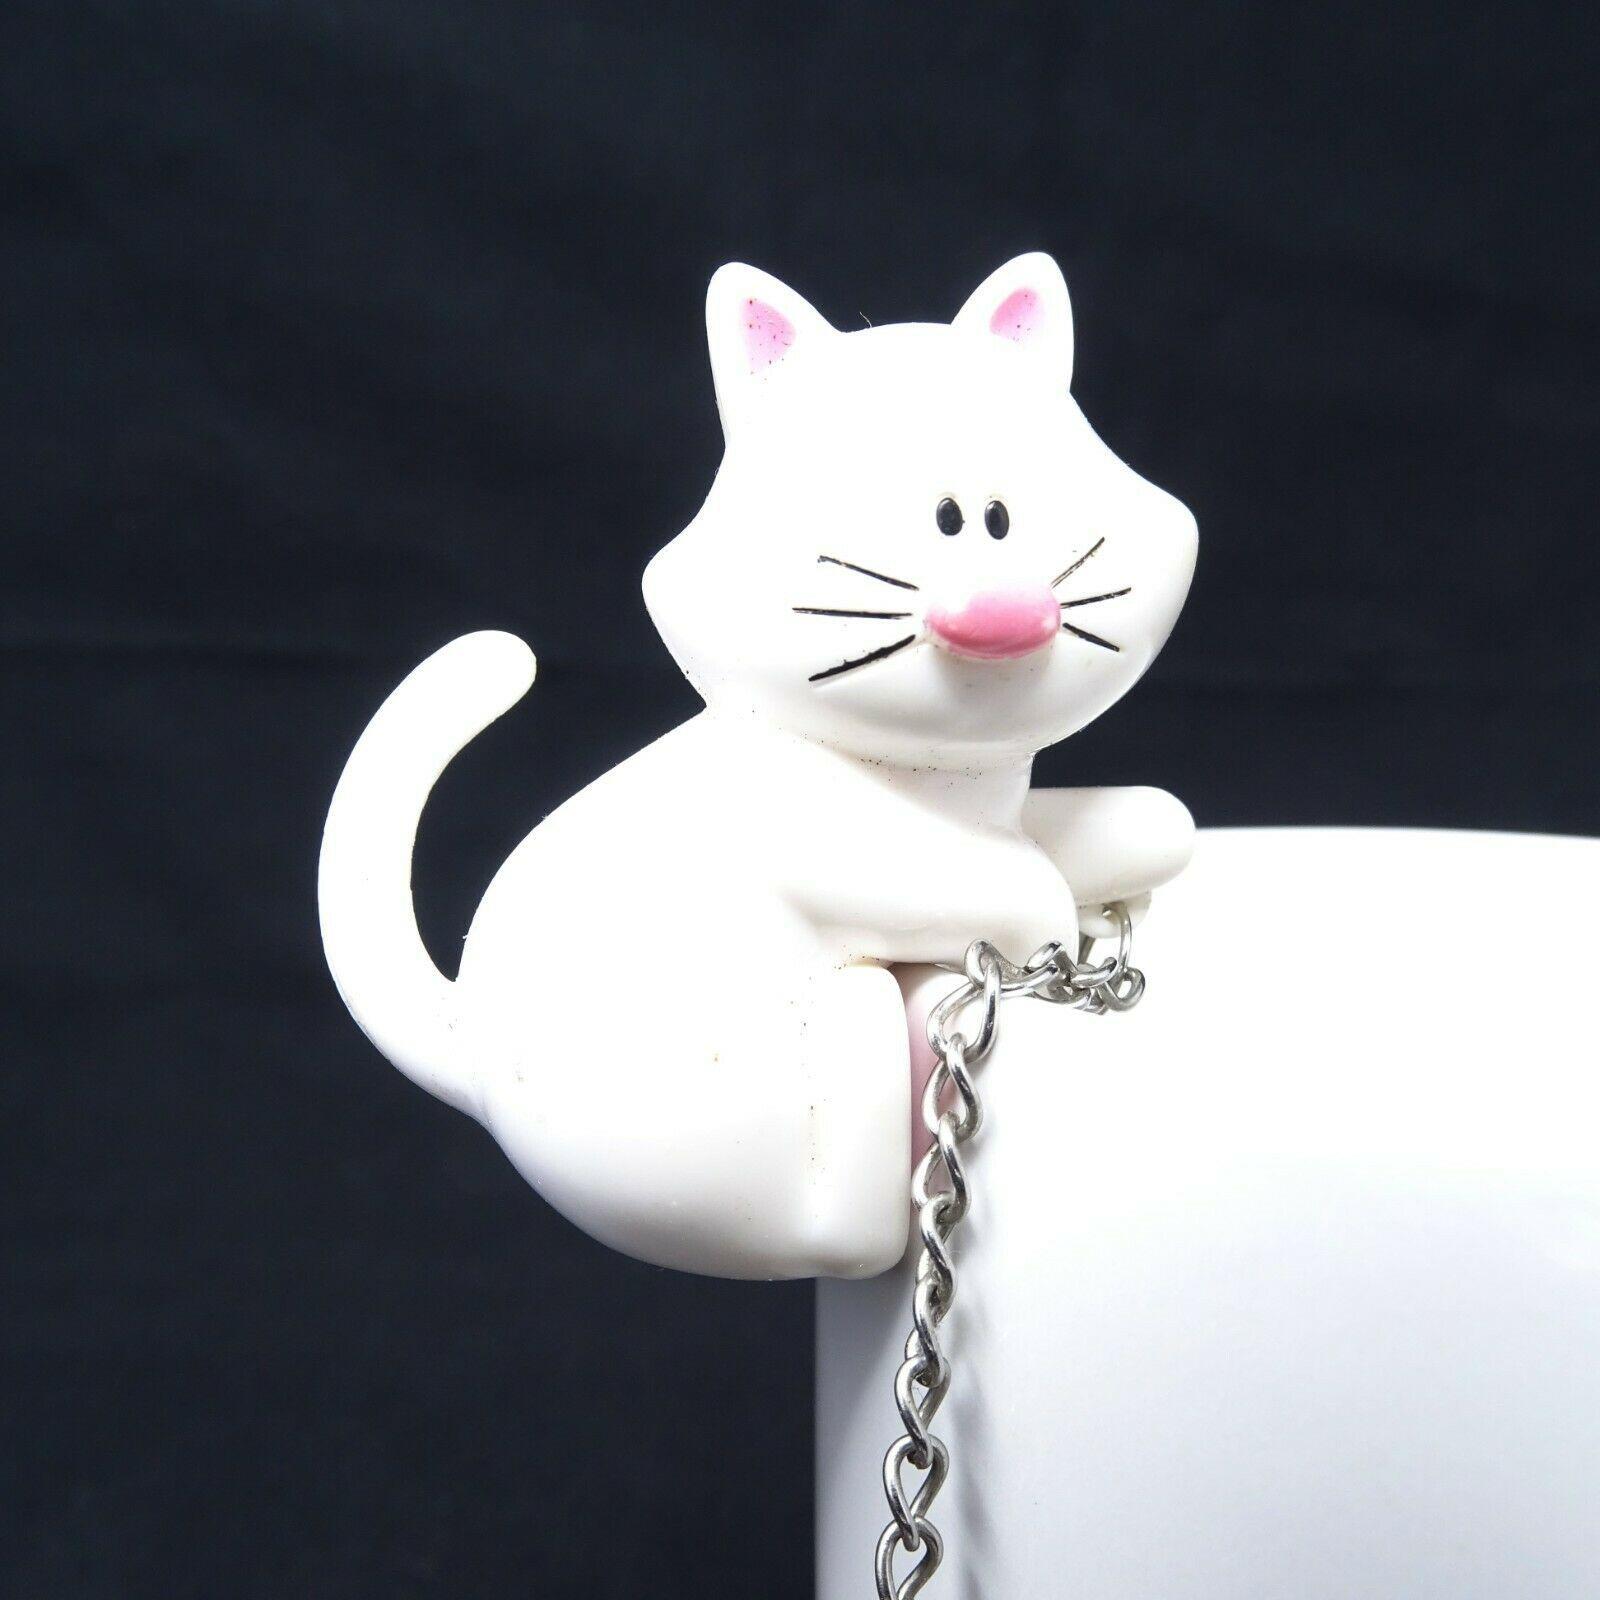 Meow Cat Fishing Tea Infuser Kitten Fish Stainless Steel White - $12.19